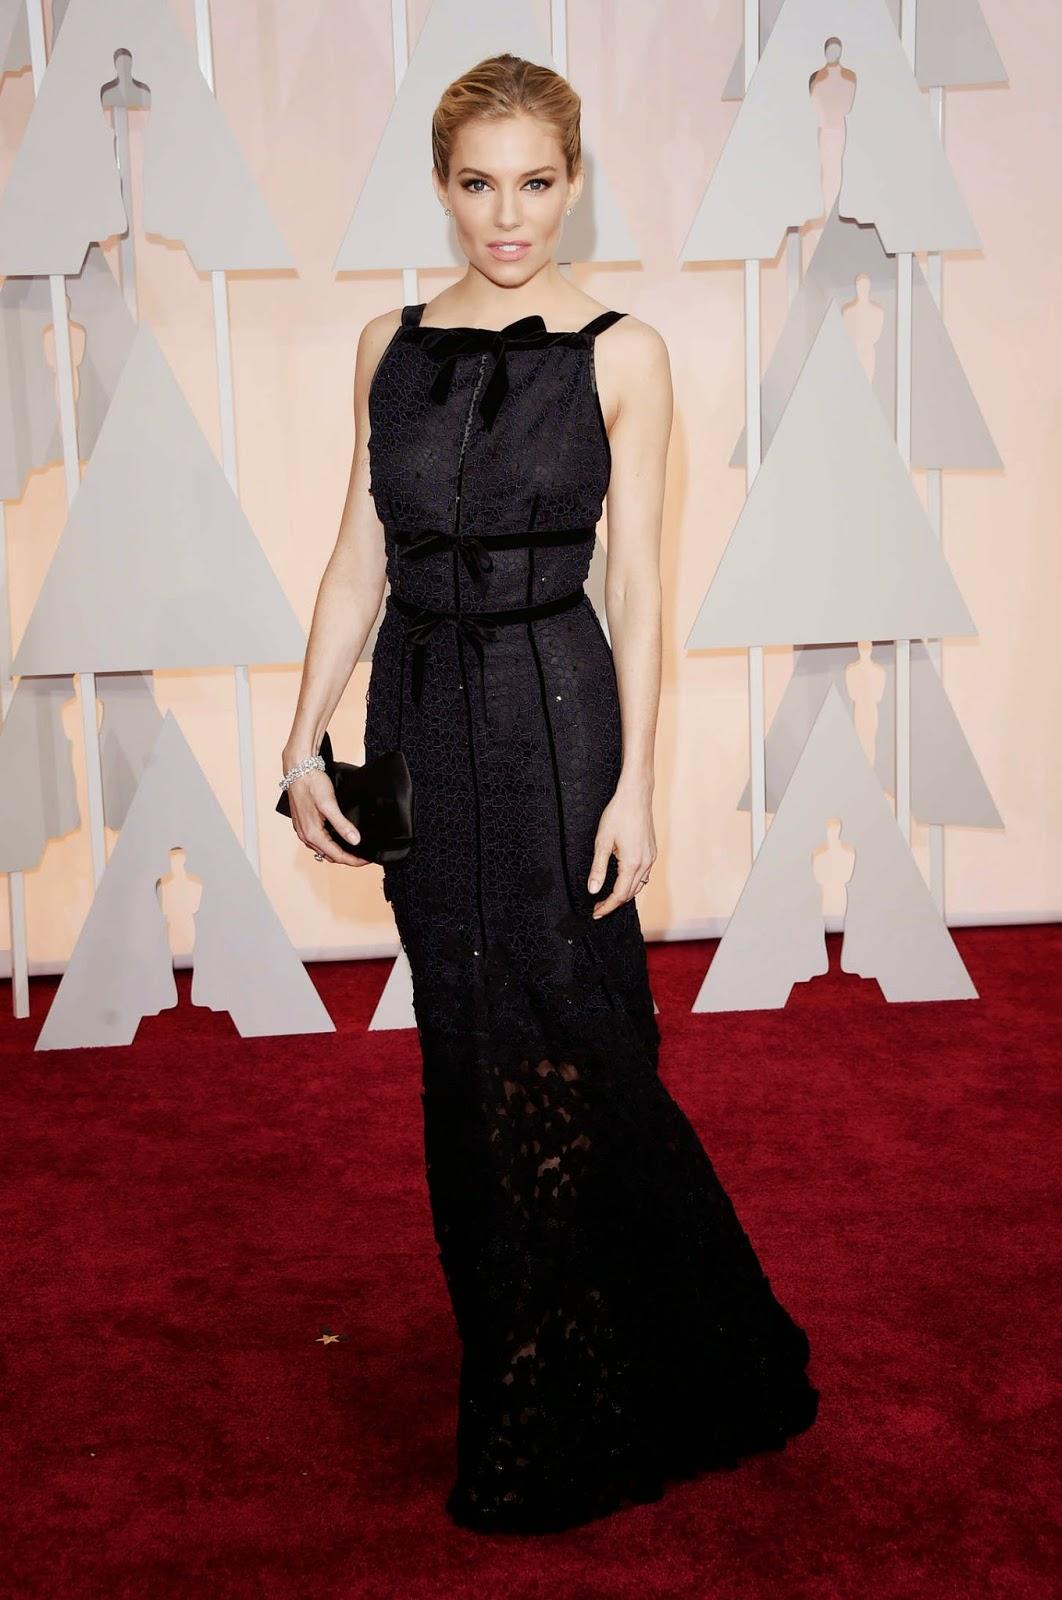 Sienna Miller wears Oscar de la Renta at the 2015 Oscars in Hollywood